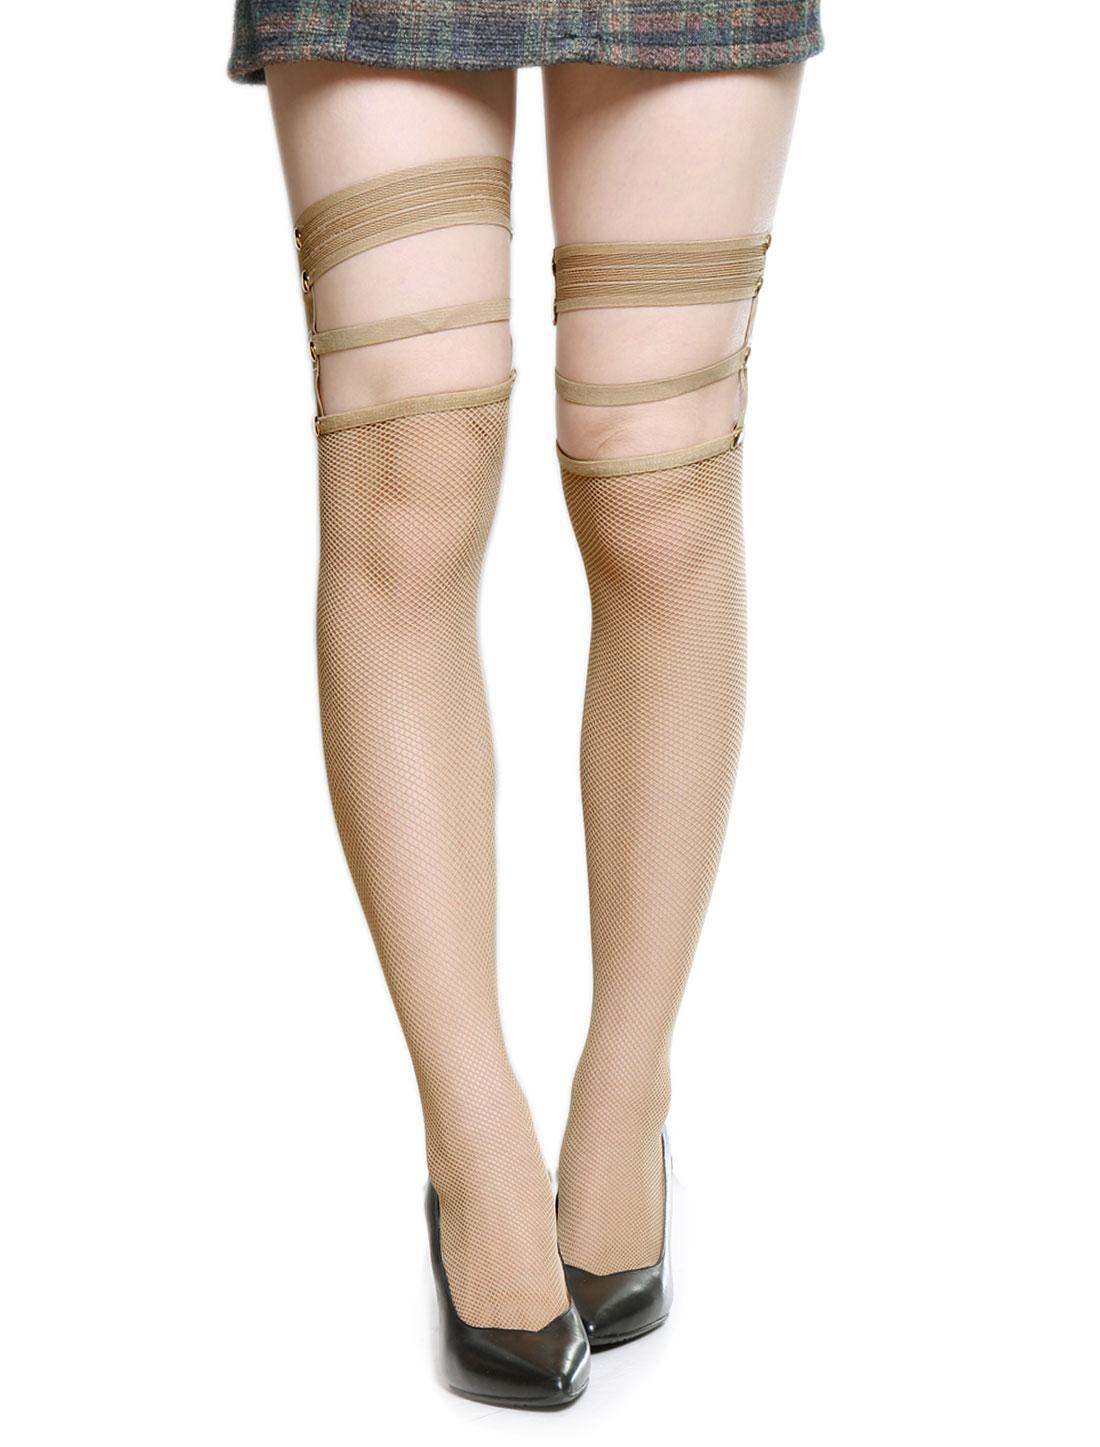 Women-Studs-Decor-Elastic-Straps-Top-Fishnet-Sexy-Thigh-High-Stockings